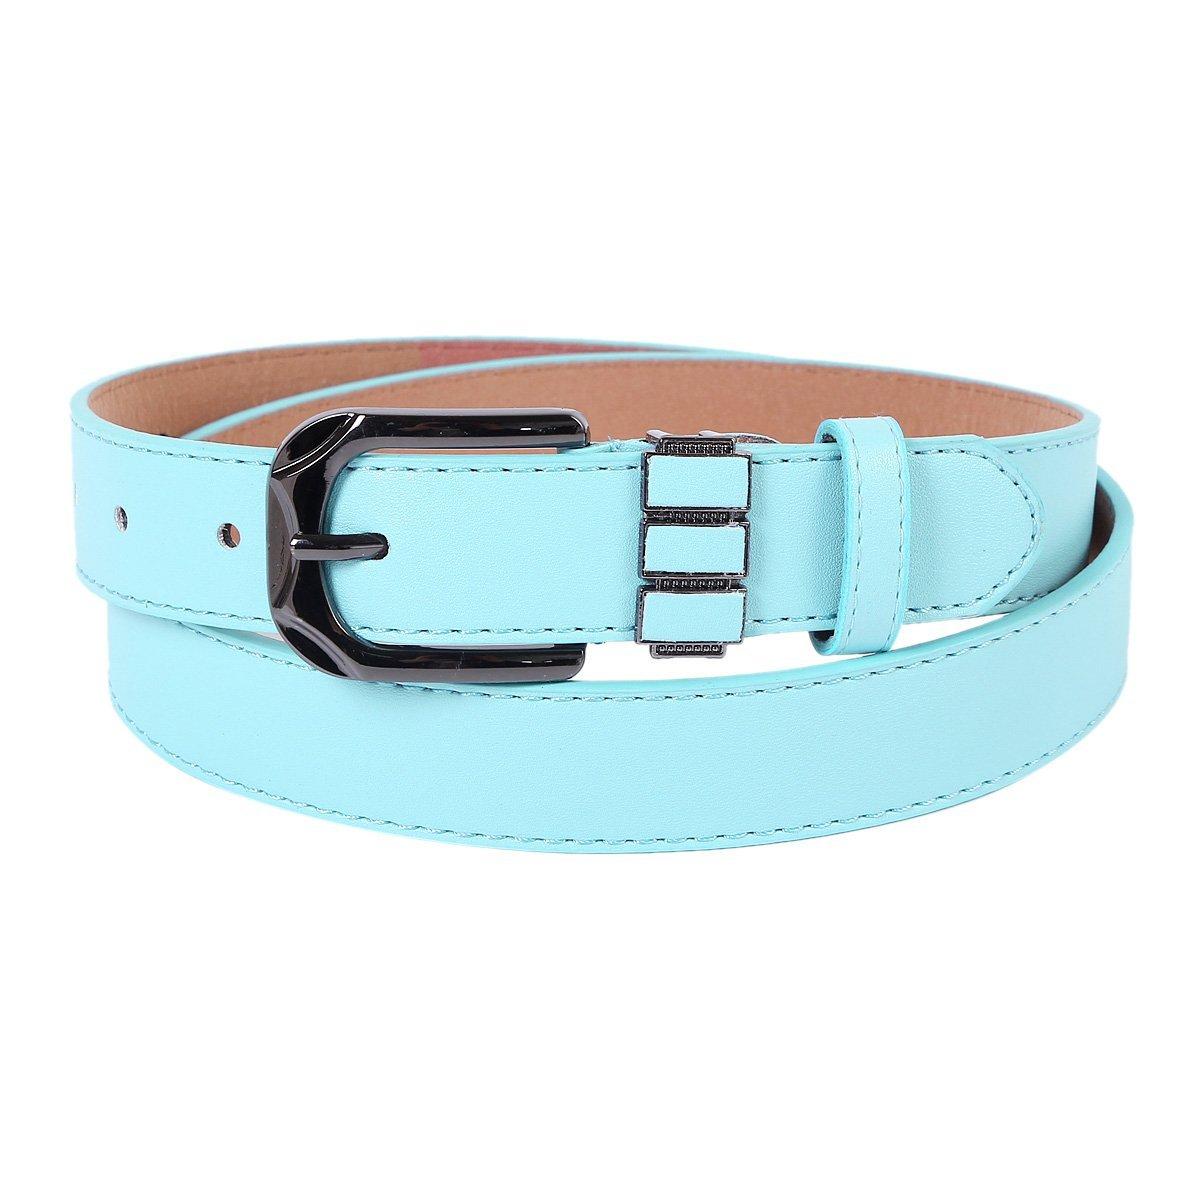 Damara Womens Classical Square Single Pin Buckle Solid Color Belt, Purple